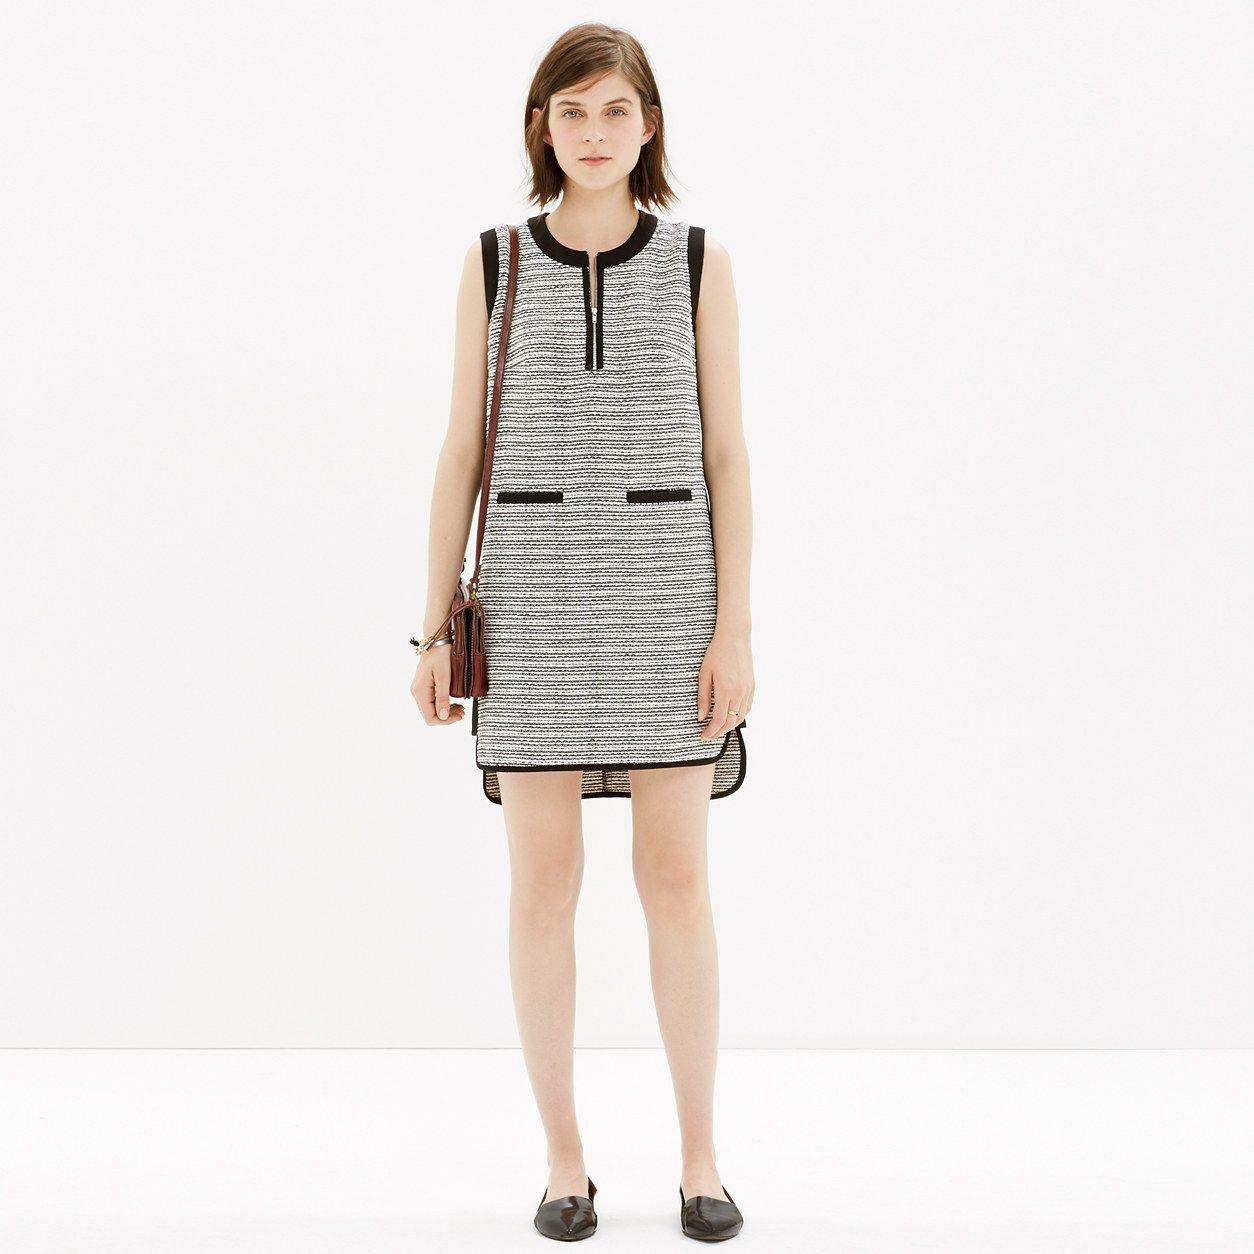 Tweedweave Shiftdress : dresses & skirts | Madewell